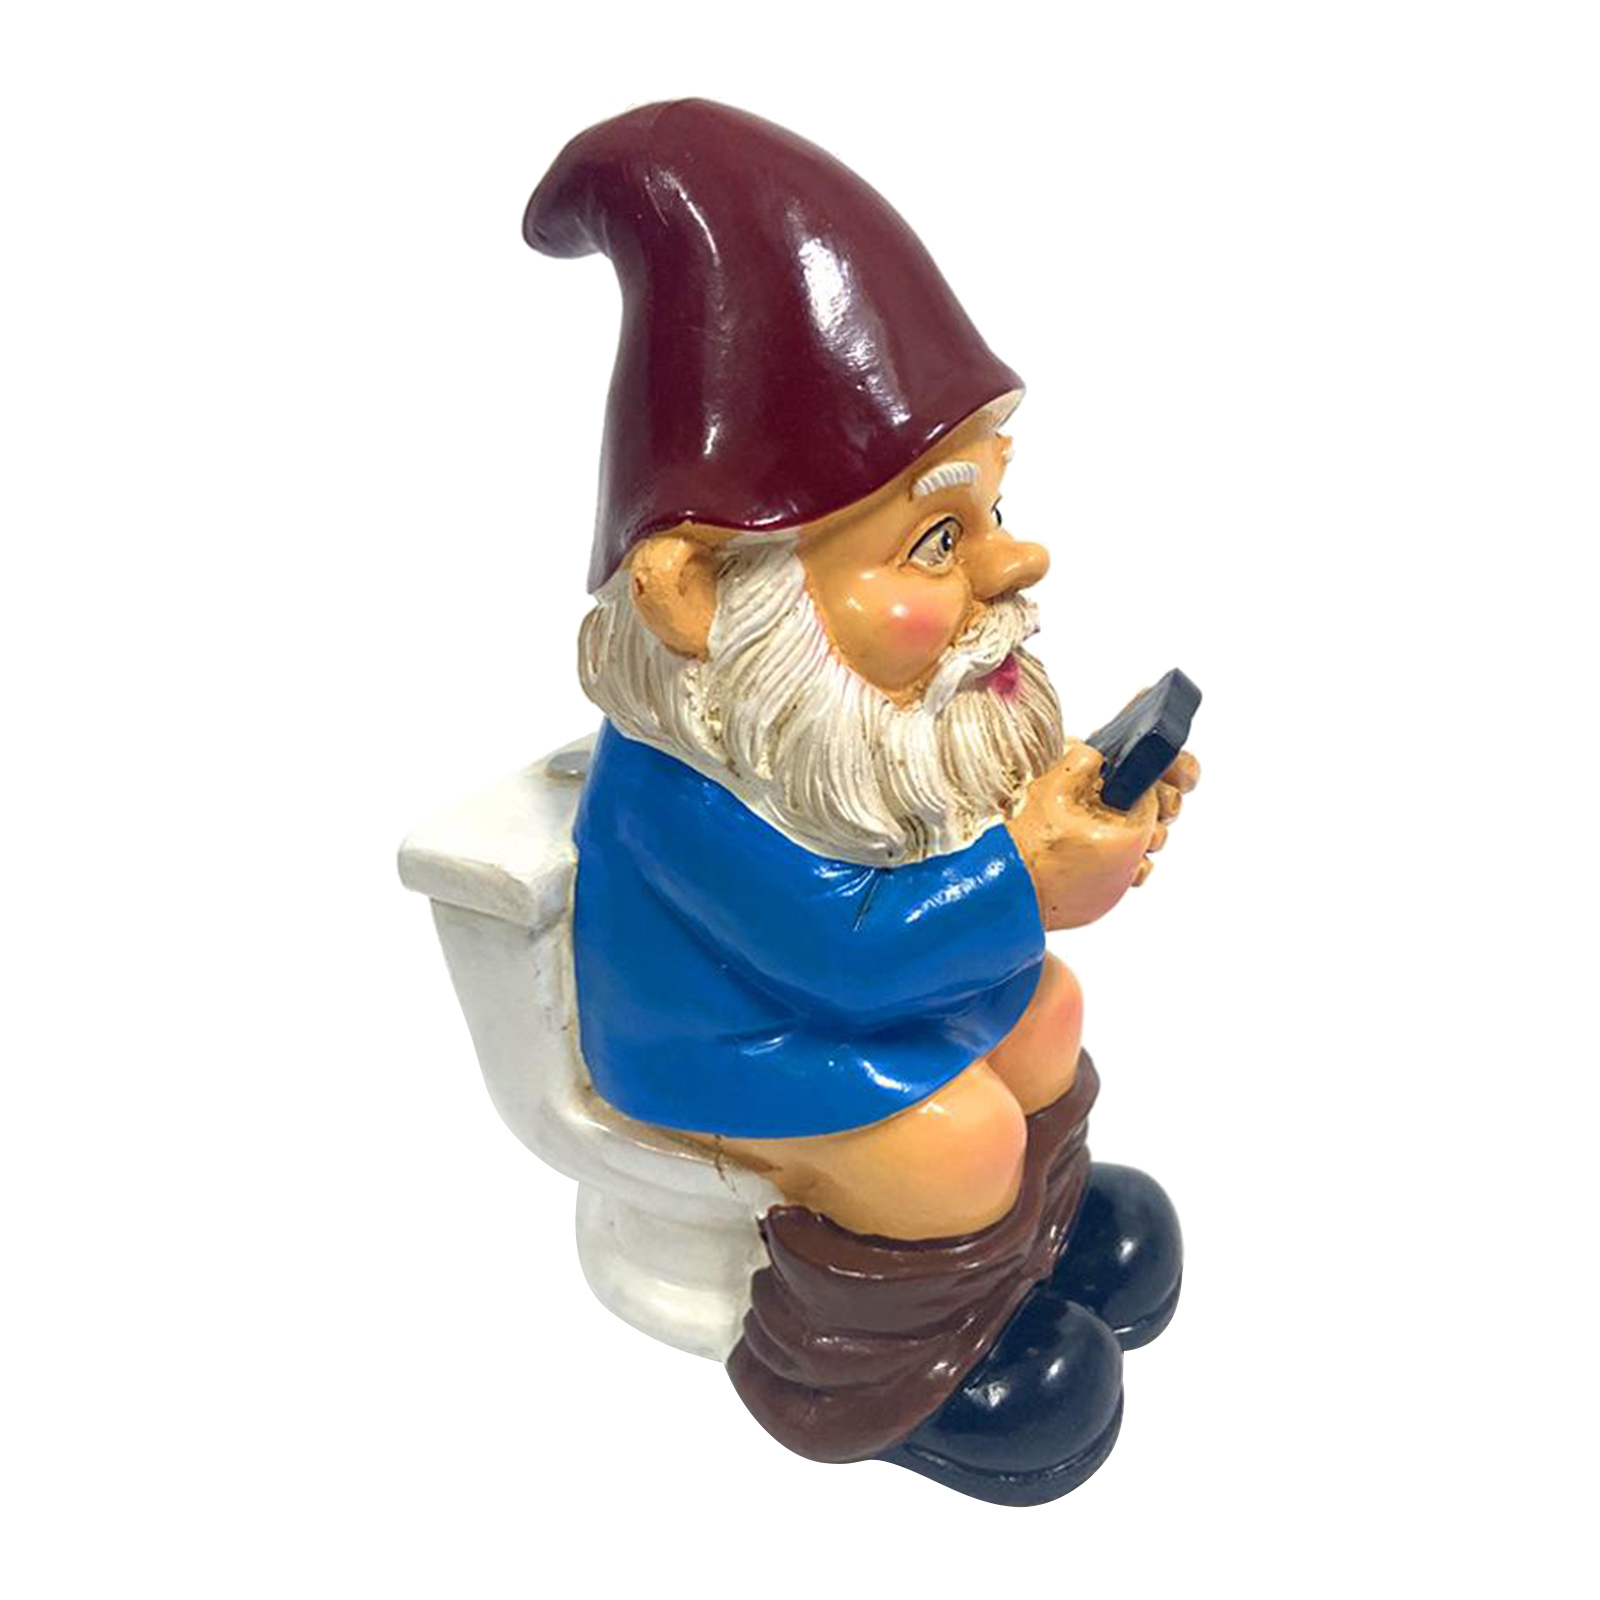 thumbnail 34 - Funny Resin Naughty Garden Gnome Statue Ornaments Villa Home Figurines Decor AU